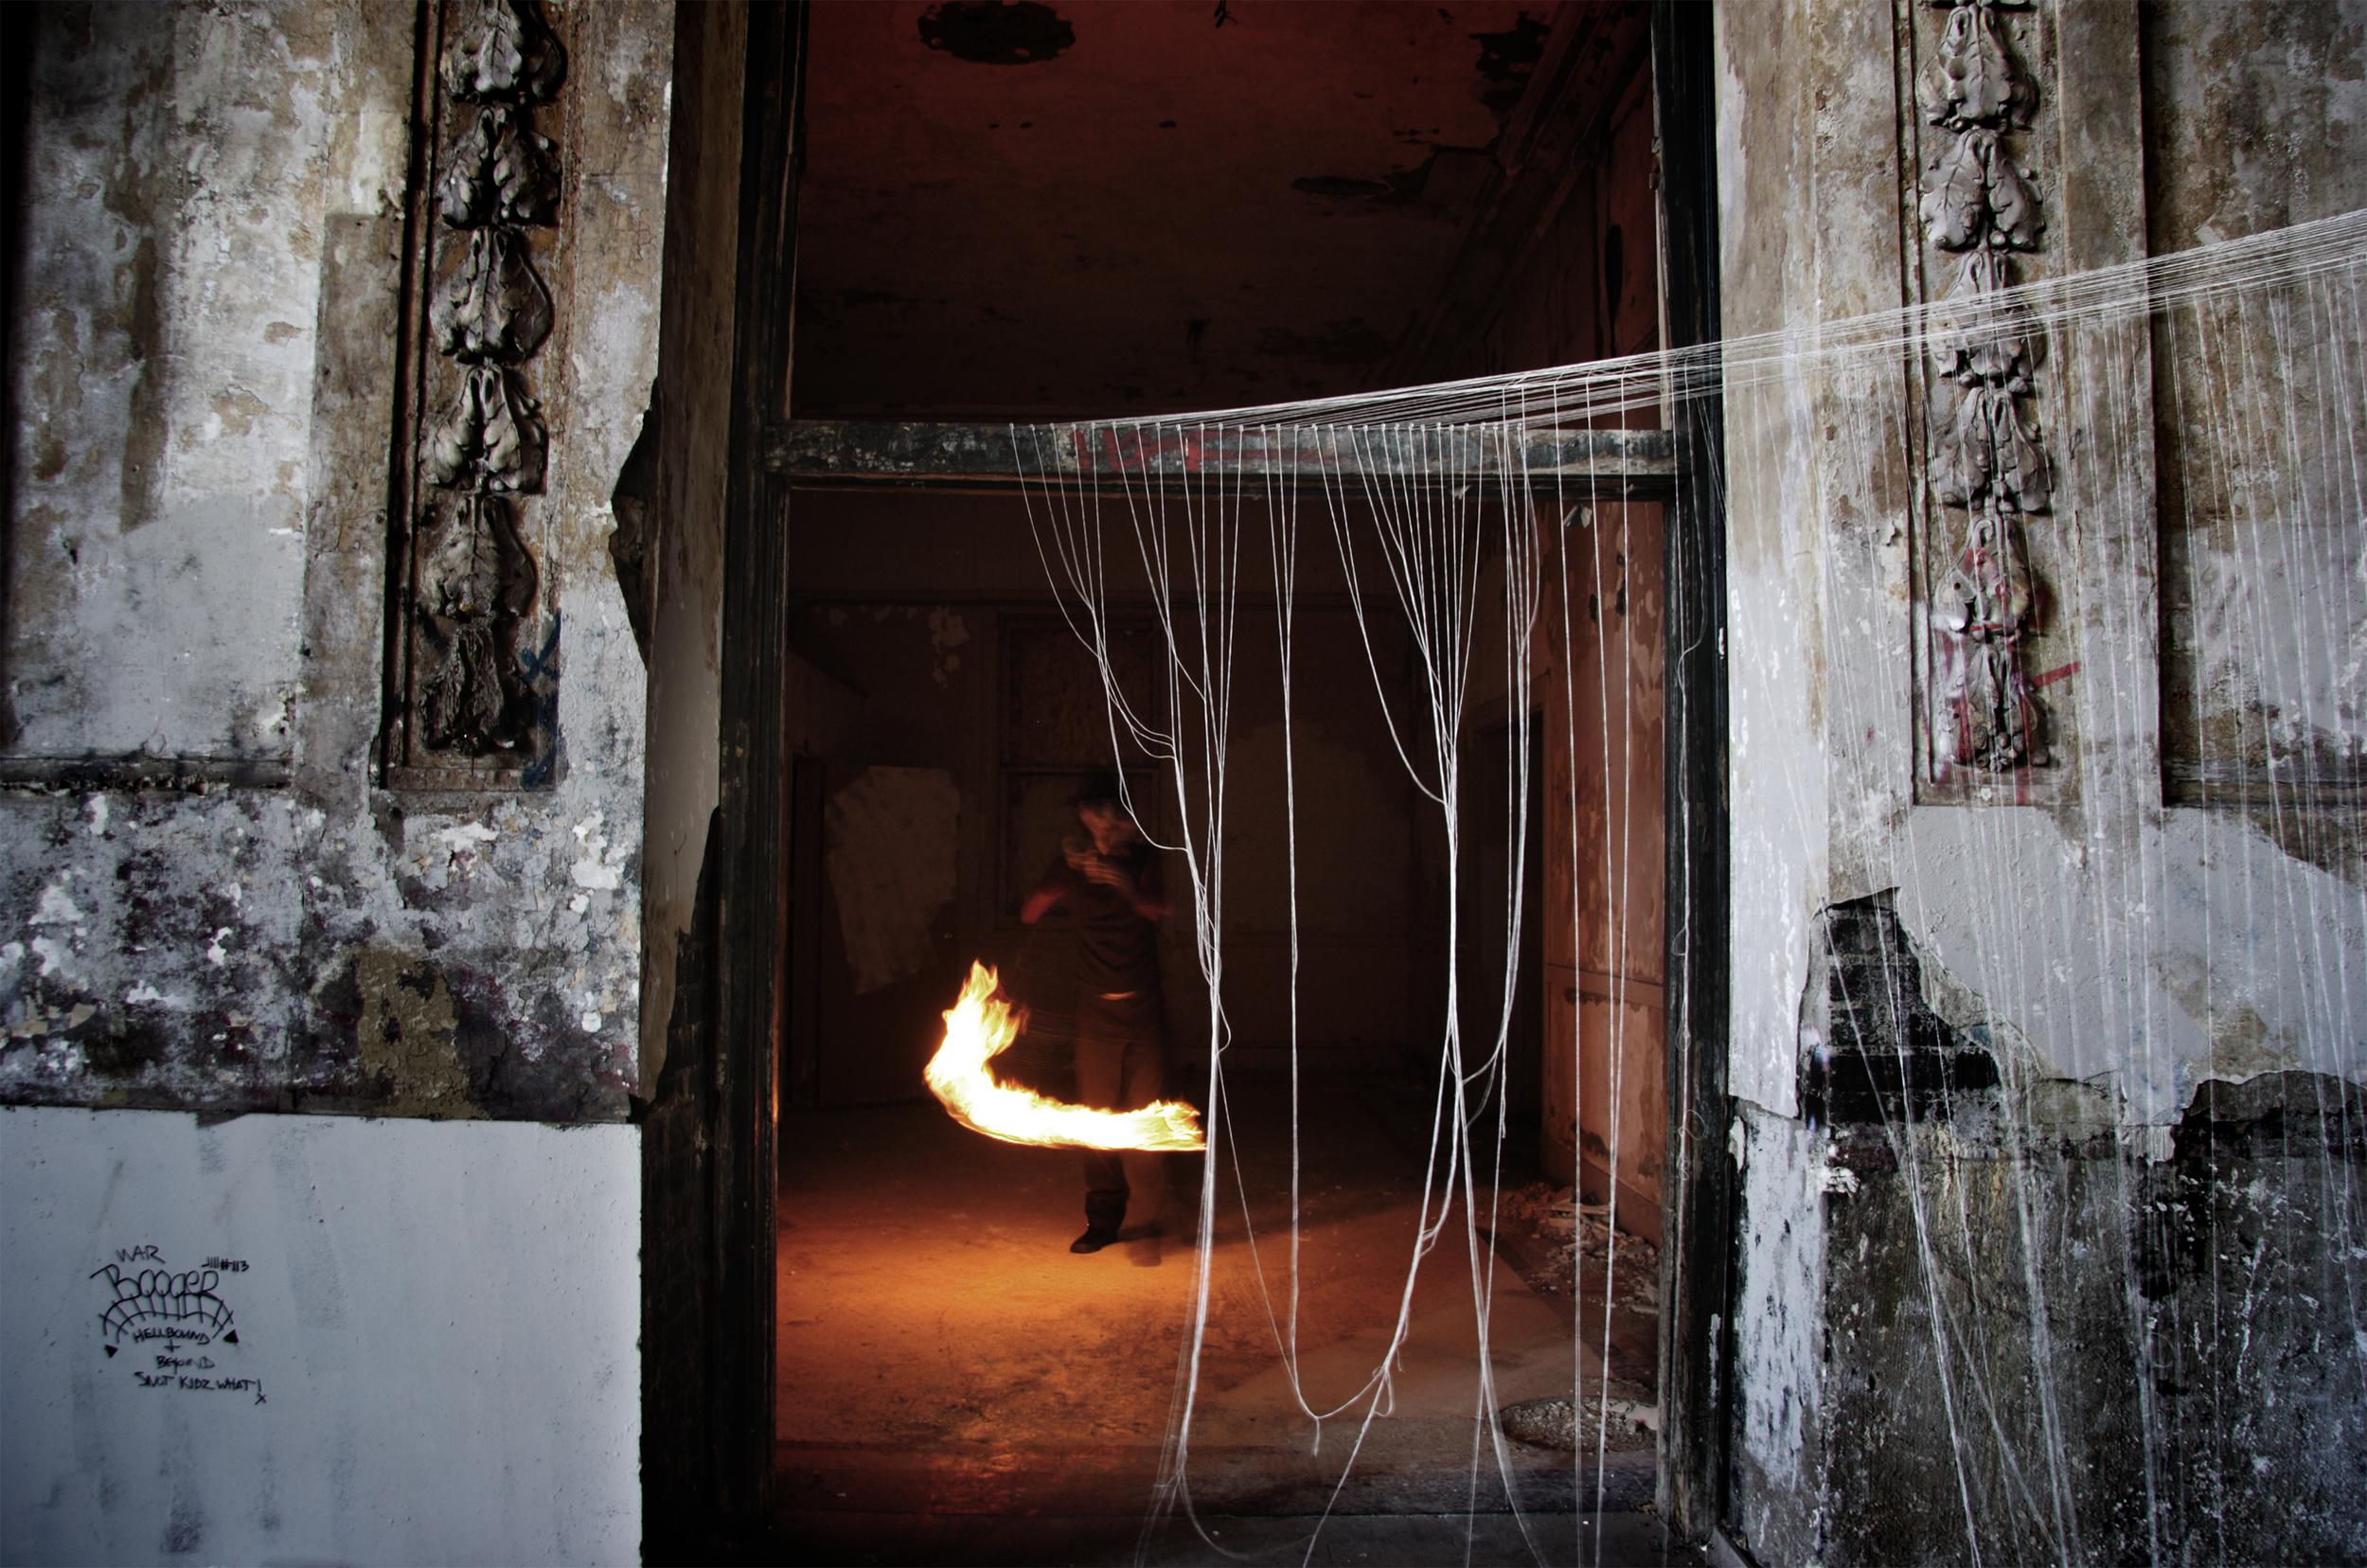 room-on-fire_497400568_o.jpg